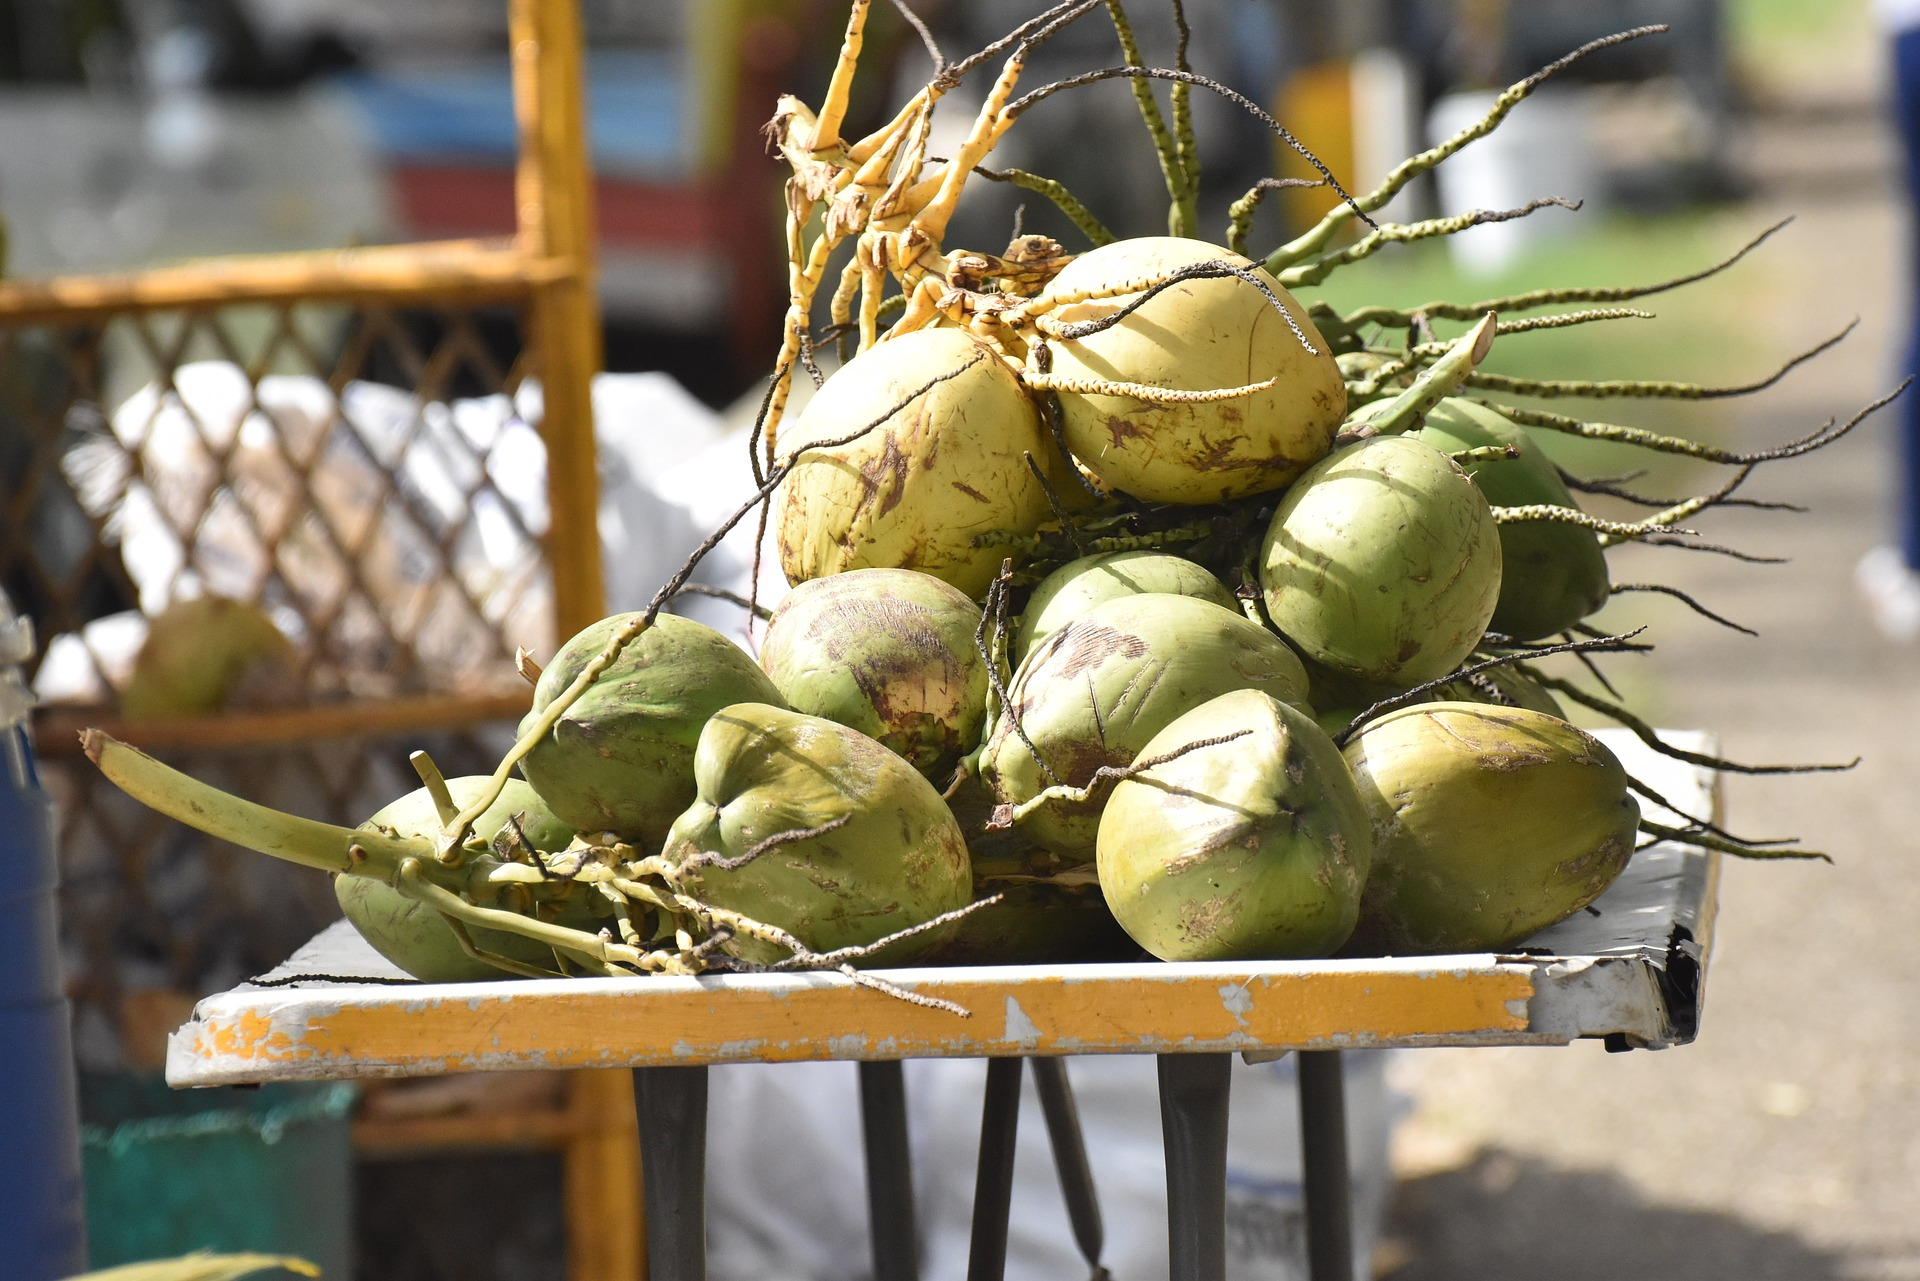 coconuts-1677275_1920.jpg